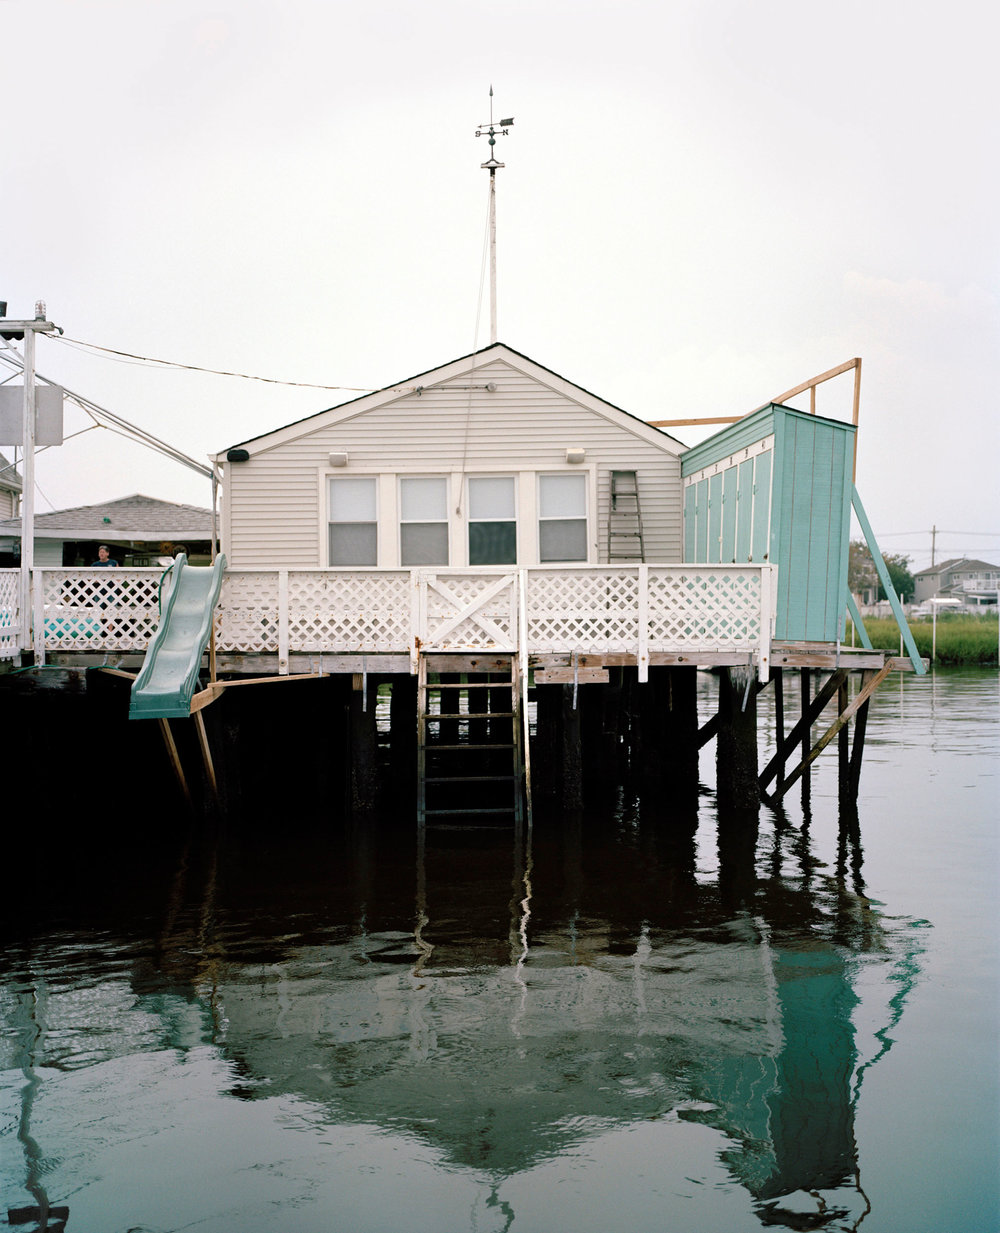 10_08_Iroquois_Yacht_Club.jpg